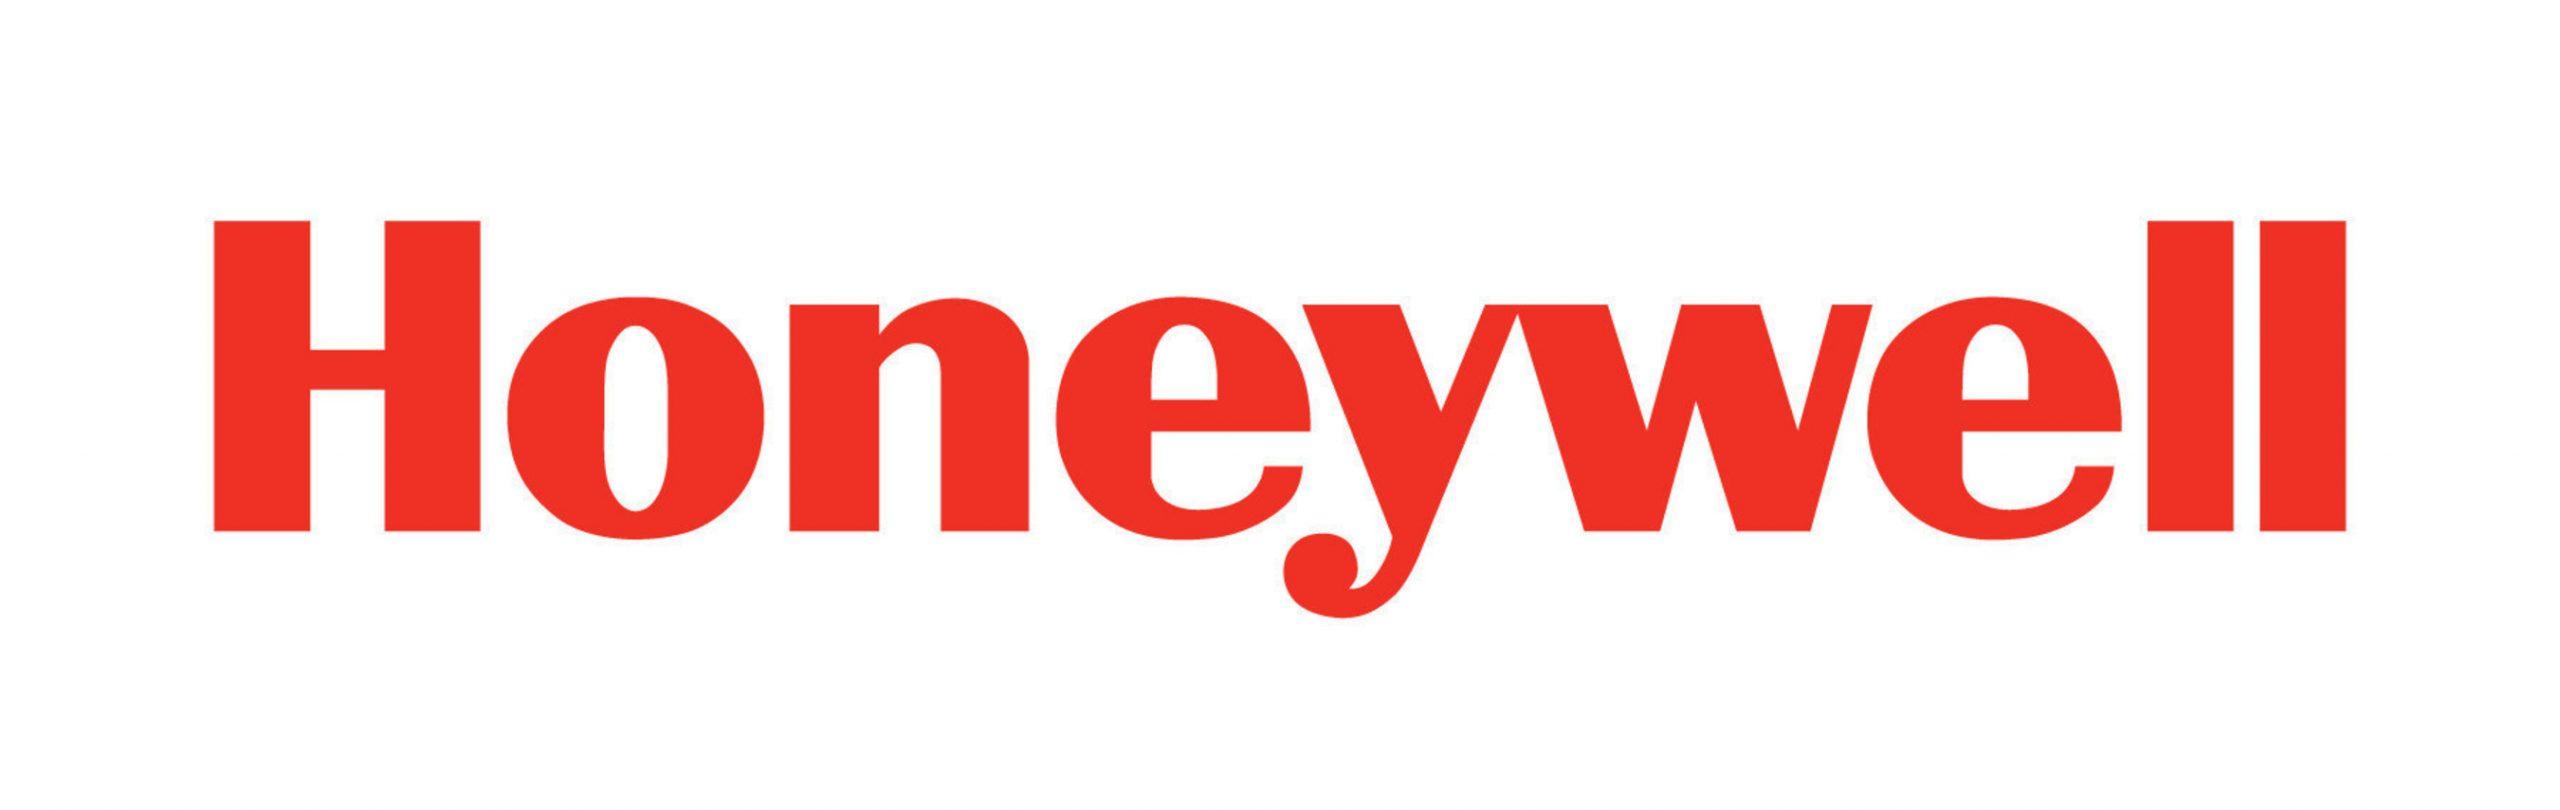 Honeywell Sensing and Productivity Solutions logo (PRNewsFoto/Honeywell)